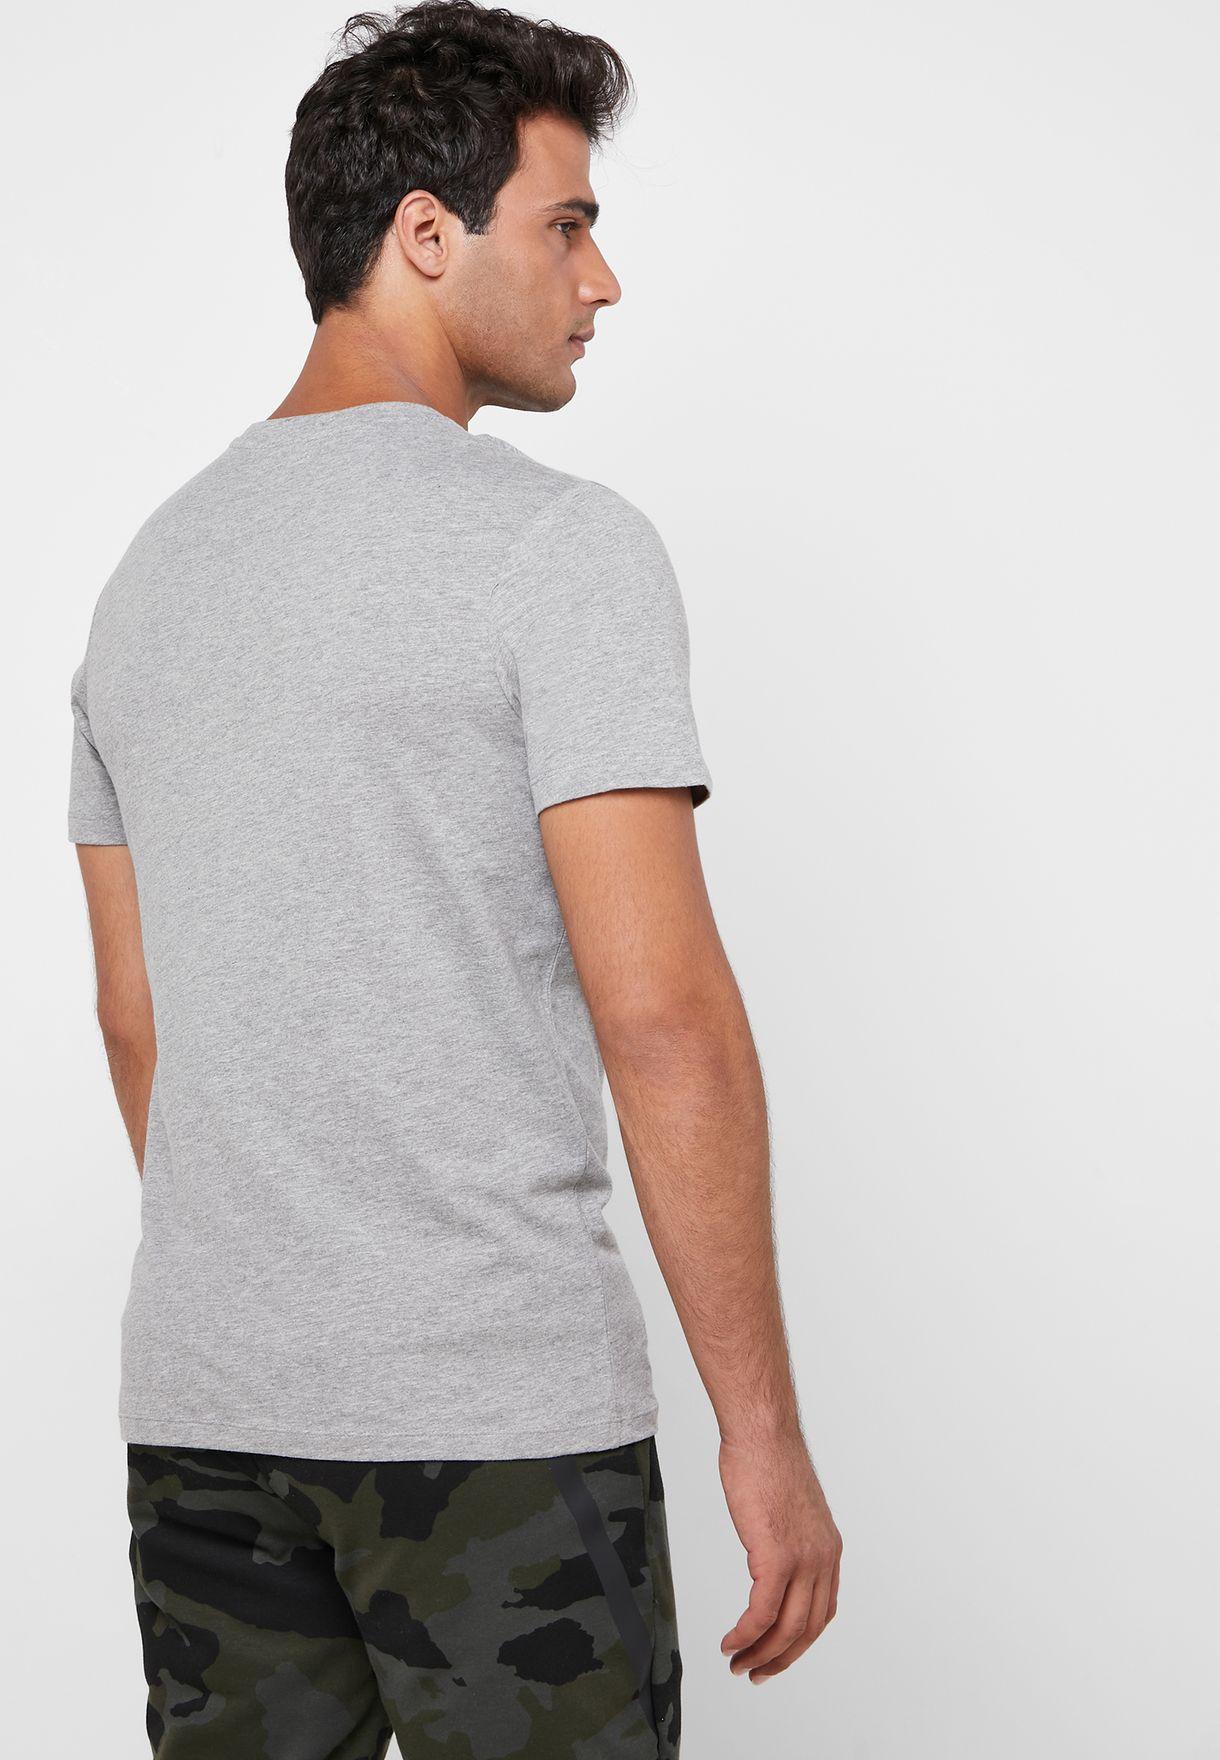 Camoclub Regular Fit Crew Neck T- Shirt